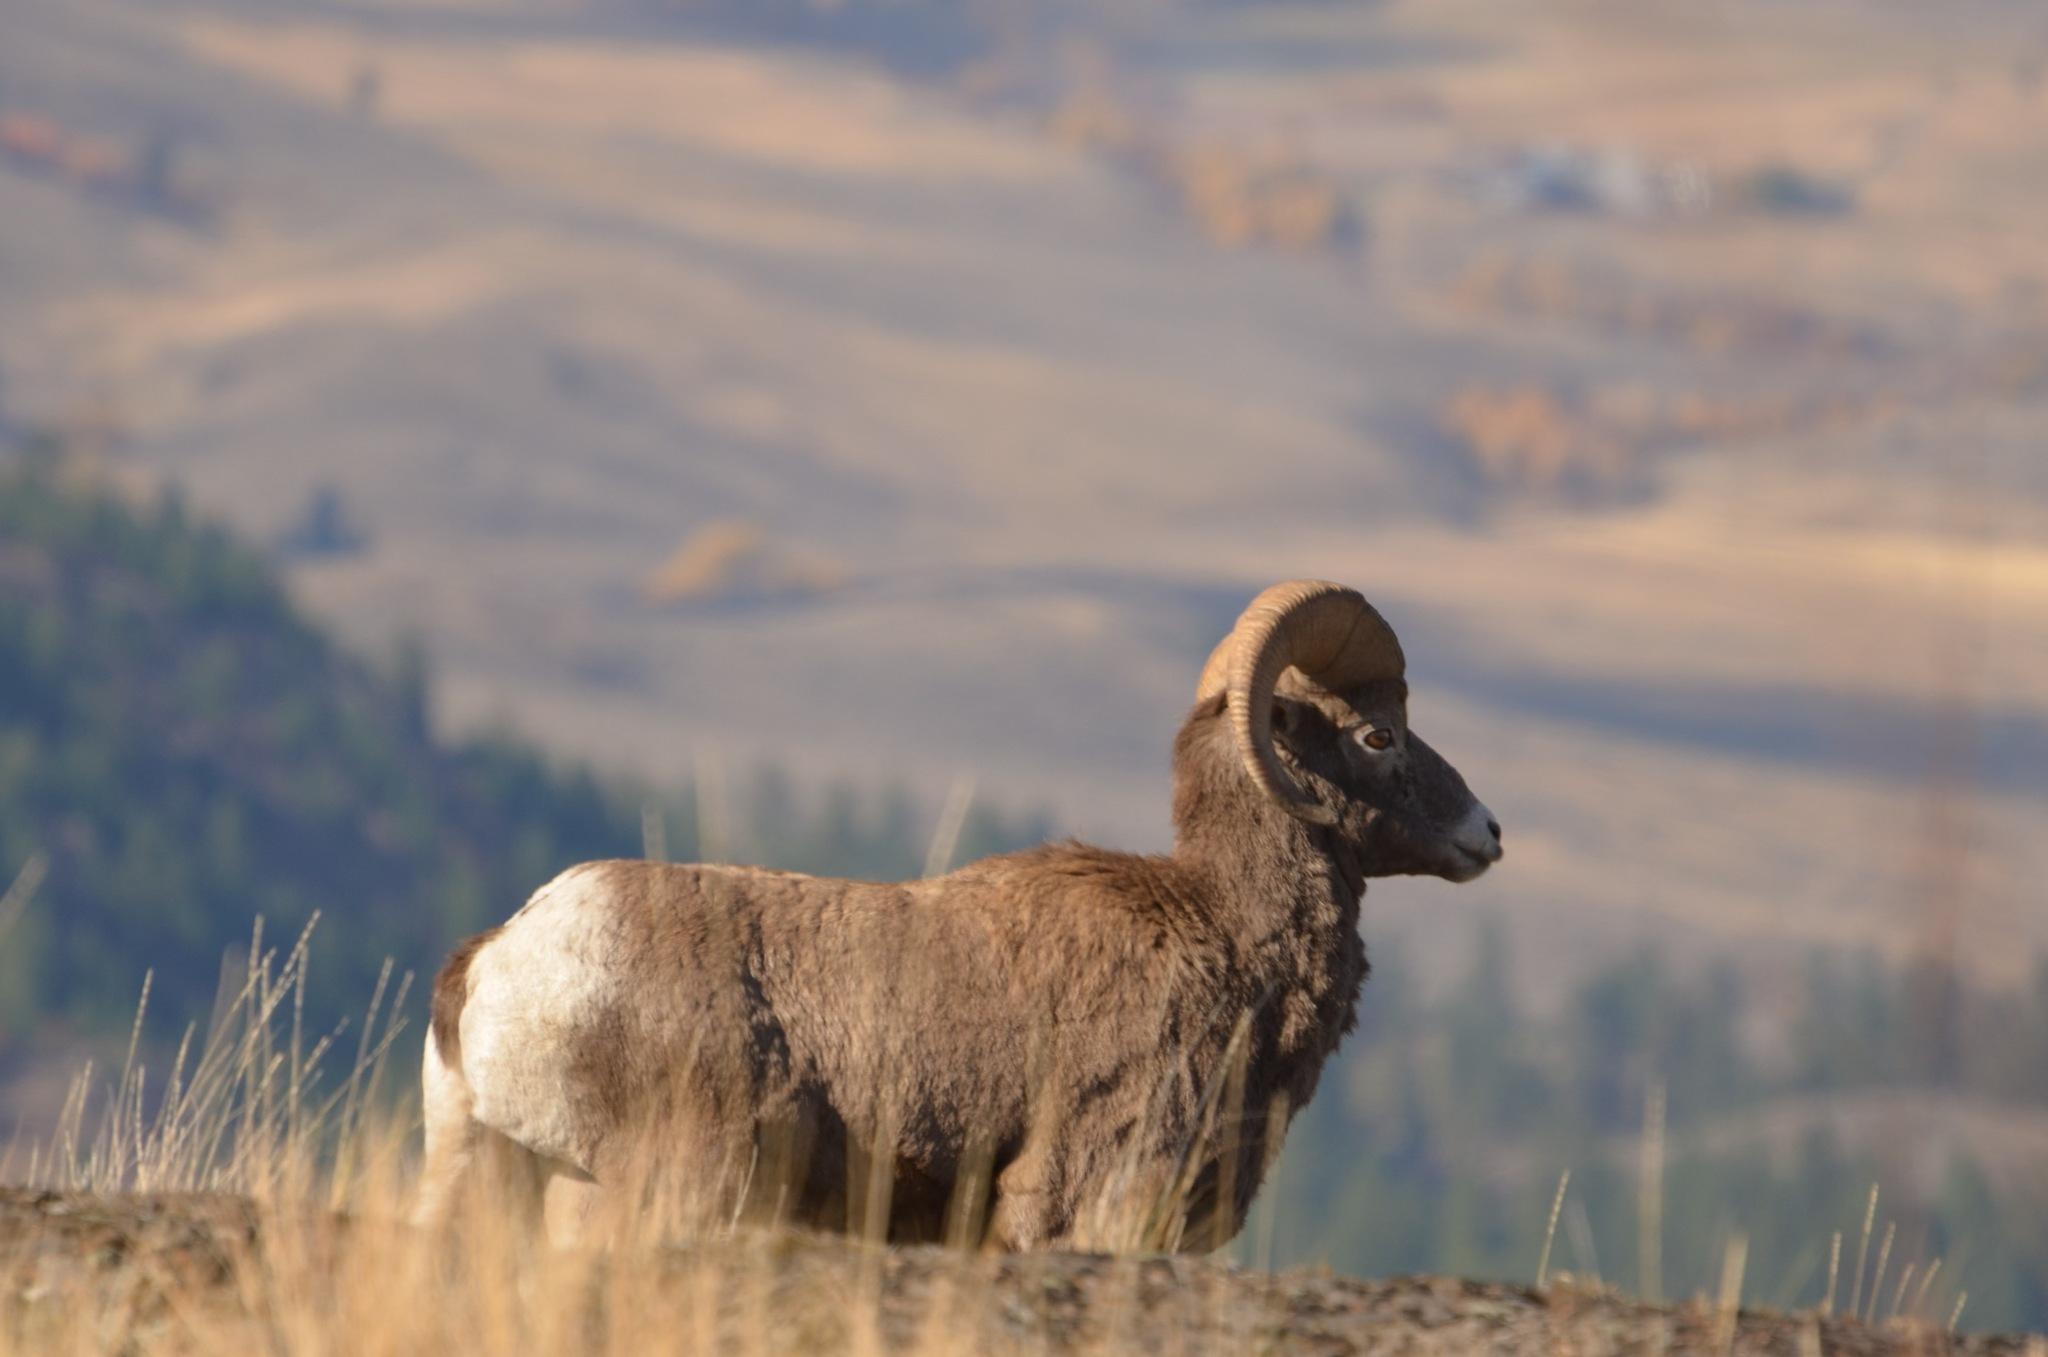 Surprise Sheep by BrianStothard